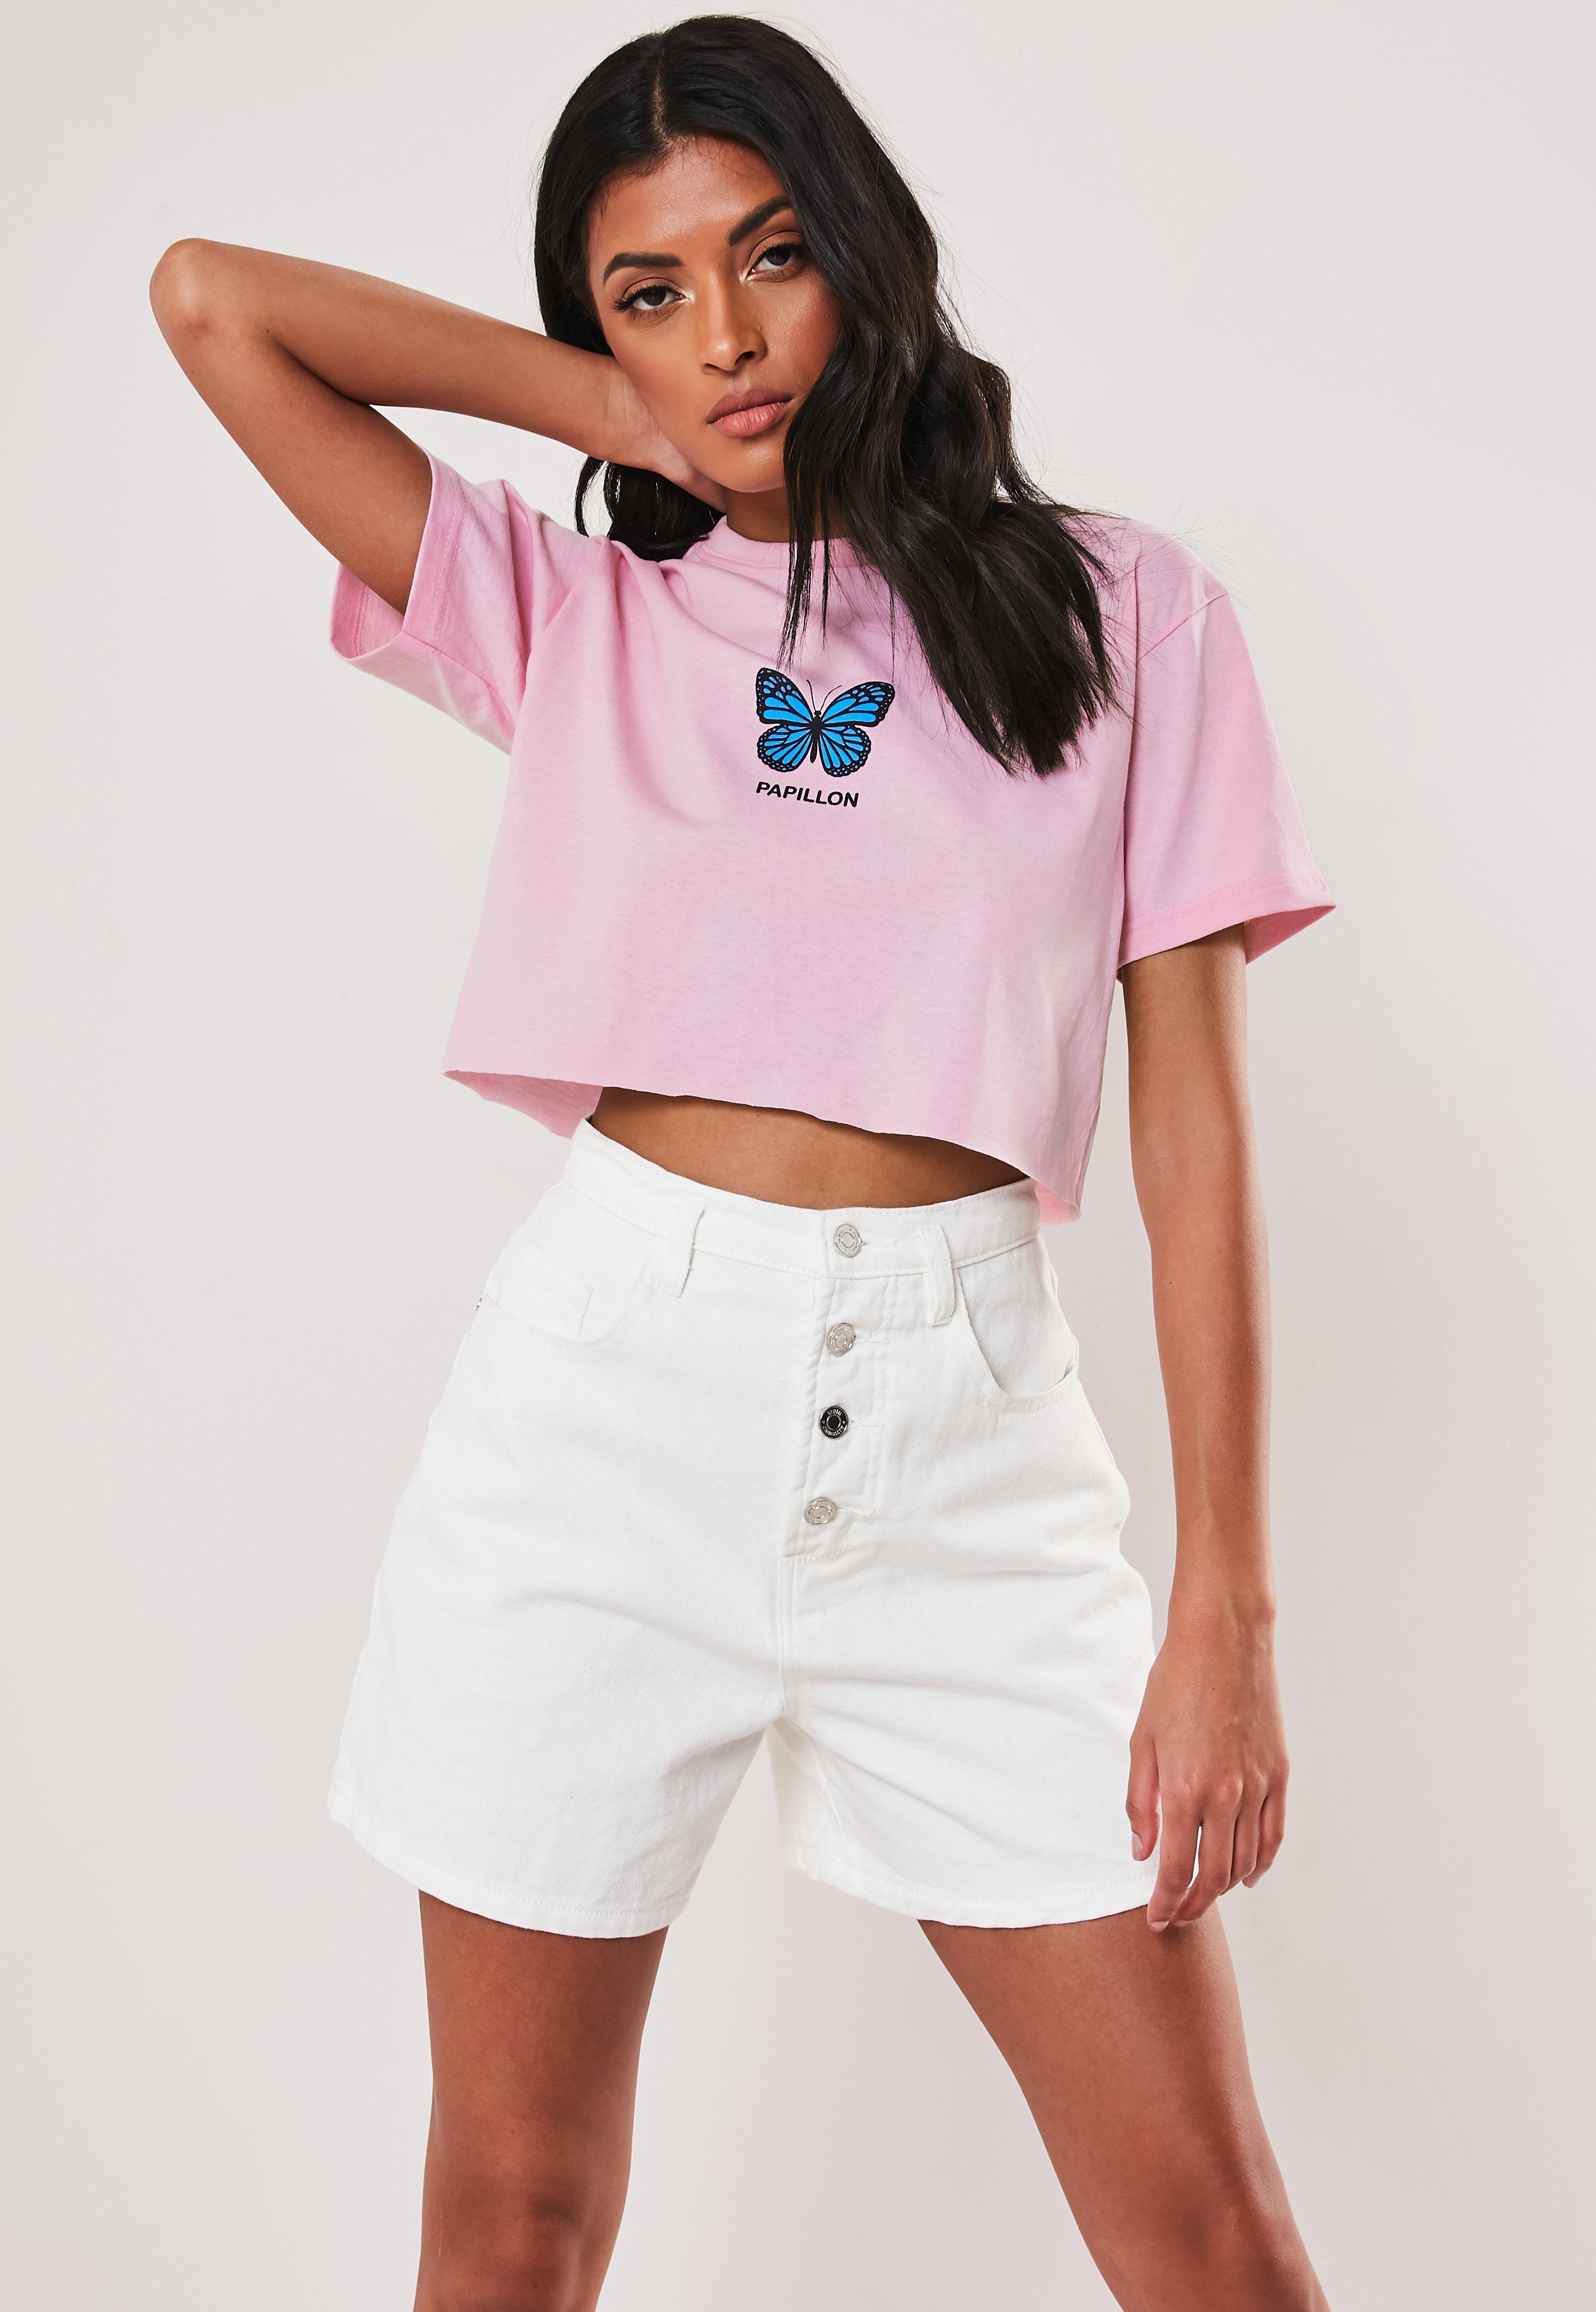 47b2abac3e1 Slogan Tees, Womens Slogan T-Shirts & Tops - Missguided